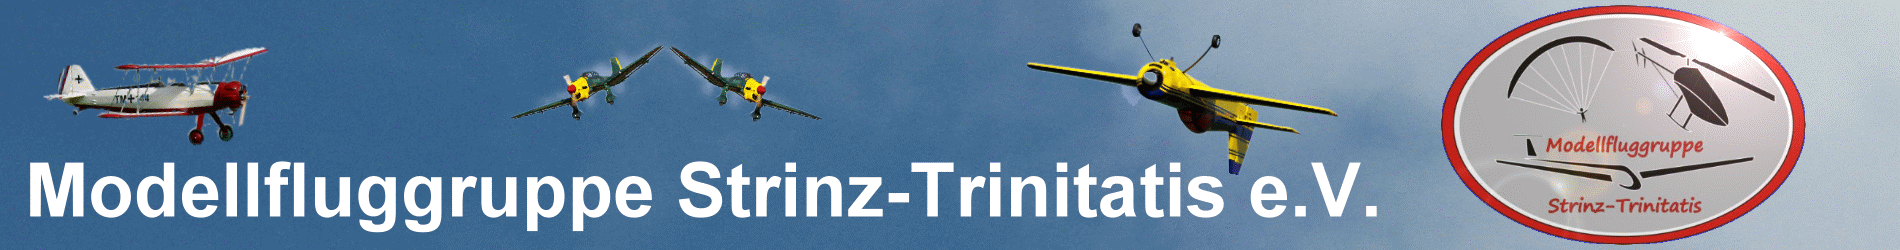 Modellfluggruppe Strinz Trinitatis e.V.